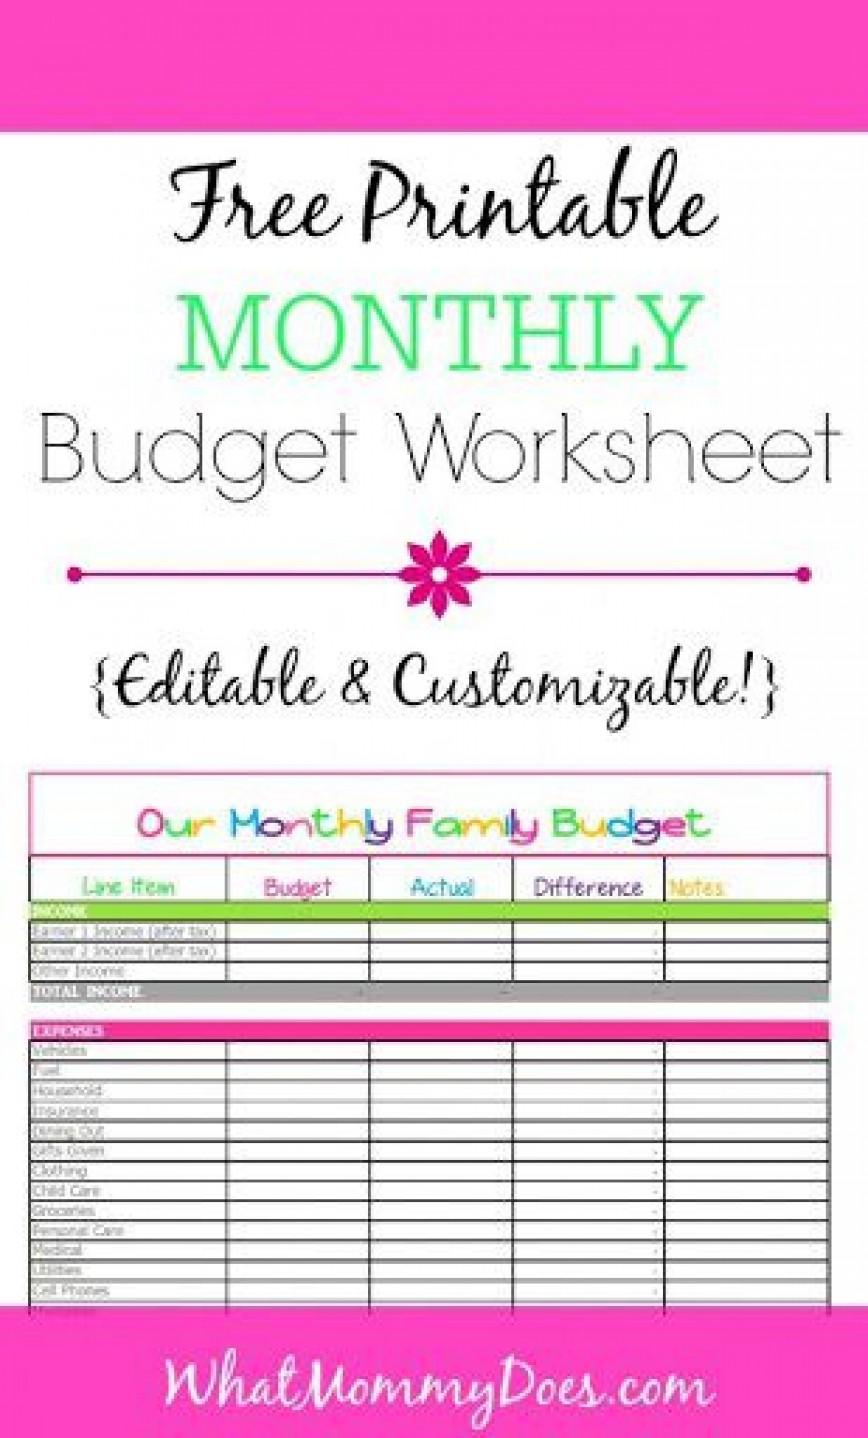 000 Striking Free Printable Monthly Budget Form Sample  Blank Sheet Household Template Downloadable Worksheet